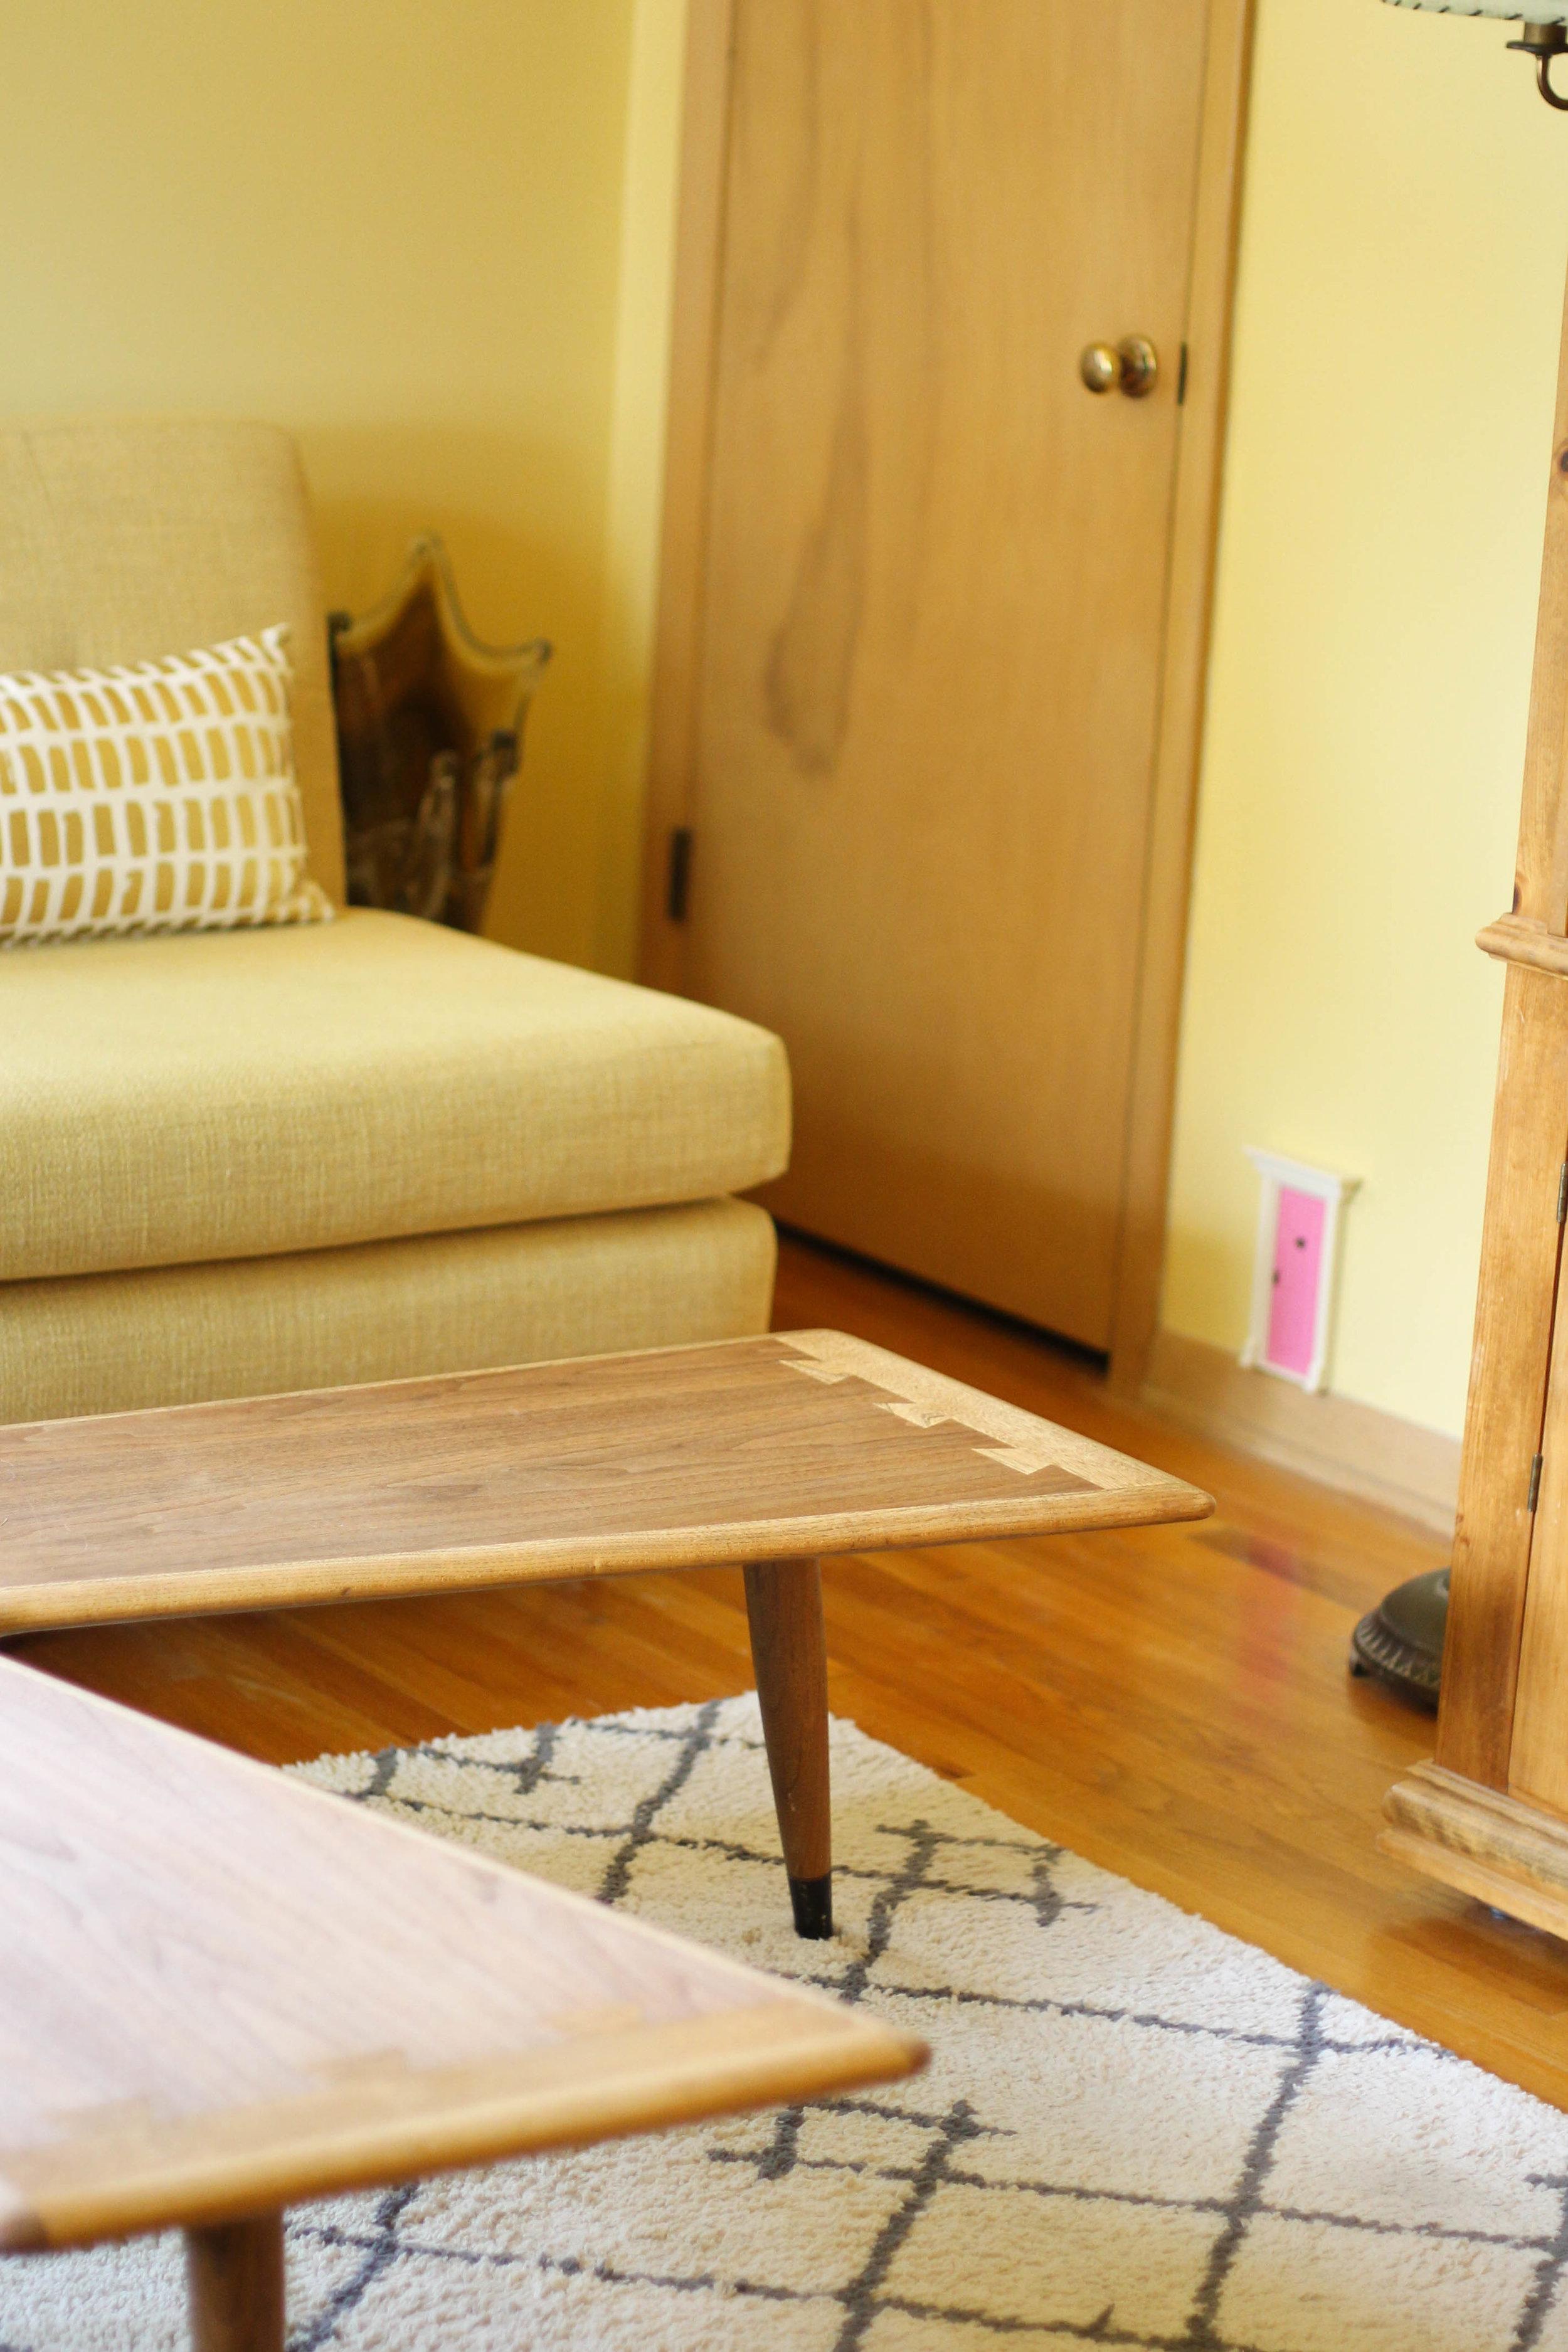 Boomerang table & a pink fairy door.